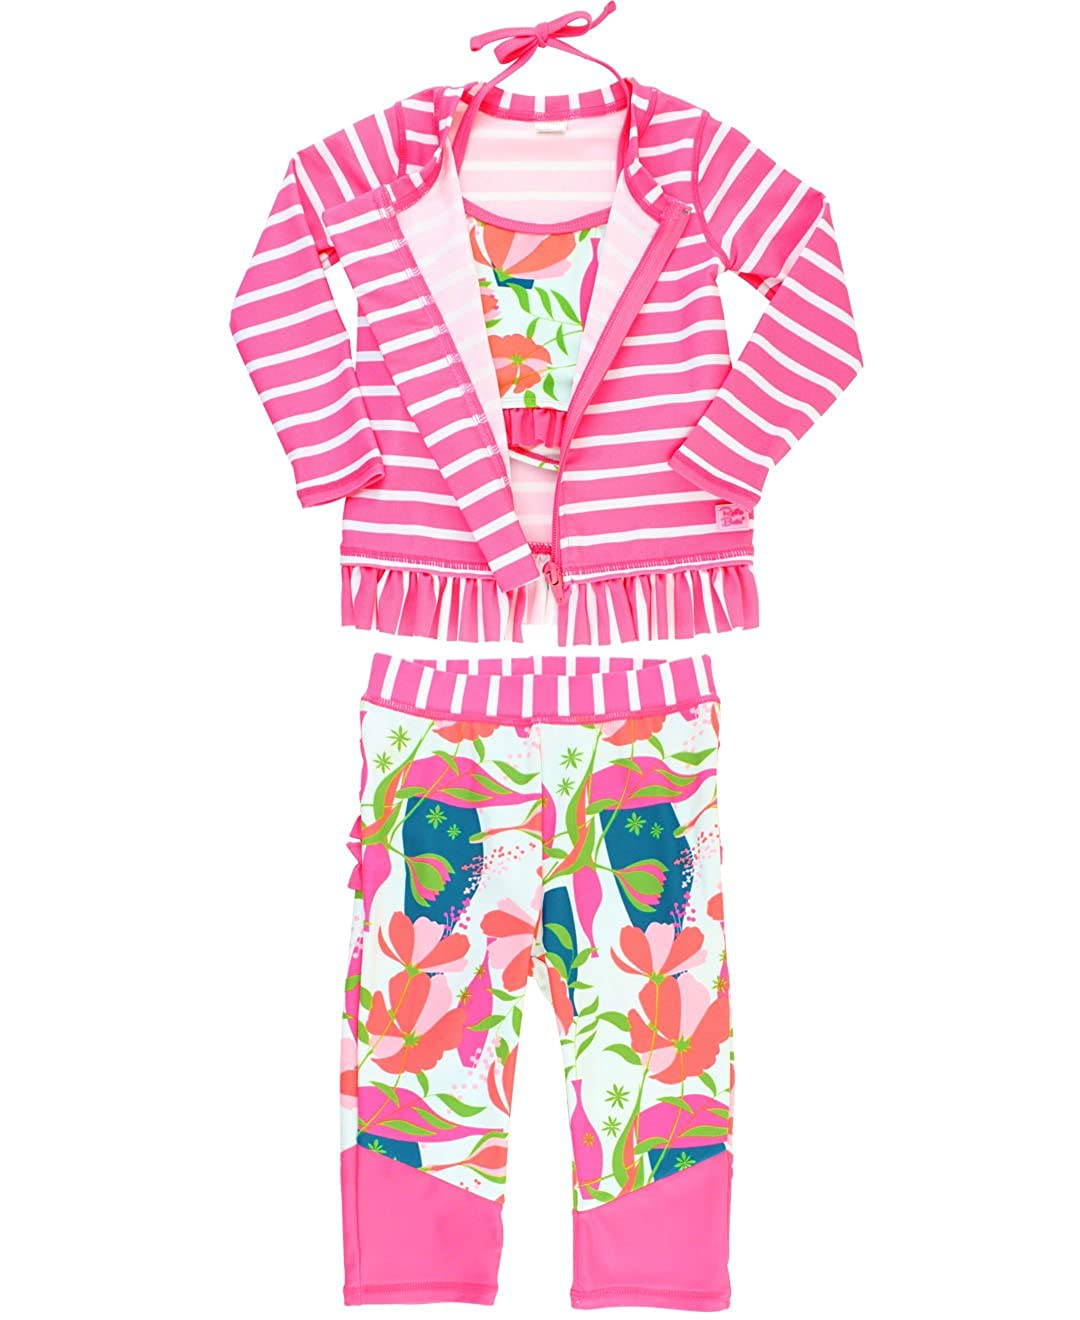 RuffleButts Little Girls Floral and Stripe 3-Piece Swim Set - Bikini Top, Long Sleeve Rash Guard Top and Swim Leggings RGSCAXX-3RJS-TDLR